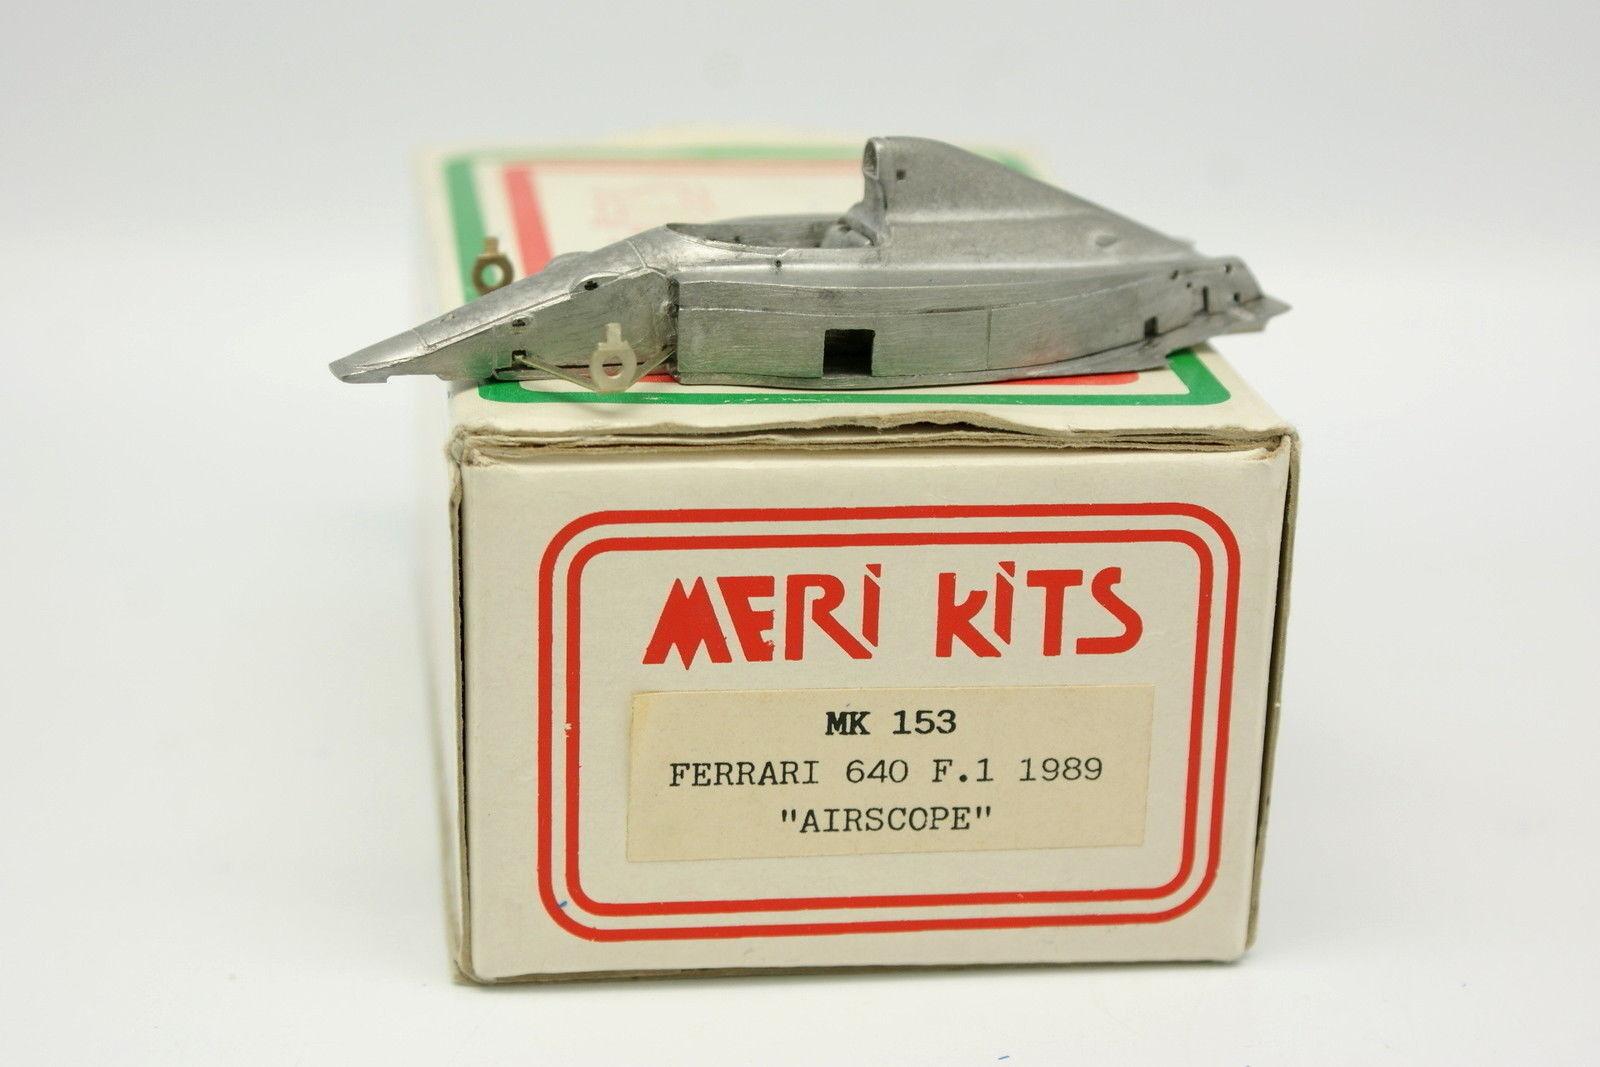 Meri Kit à monter blanc Metal 1 43 - Ferrari 640 F1 1989 Airscope